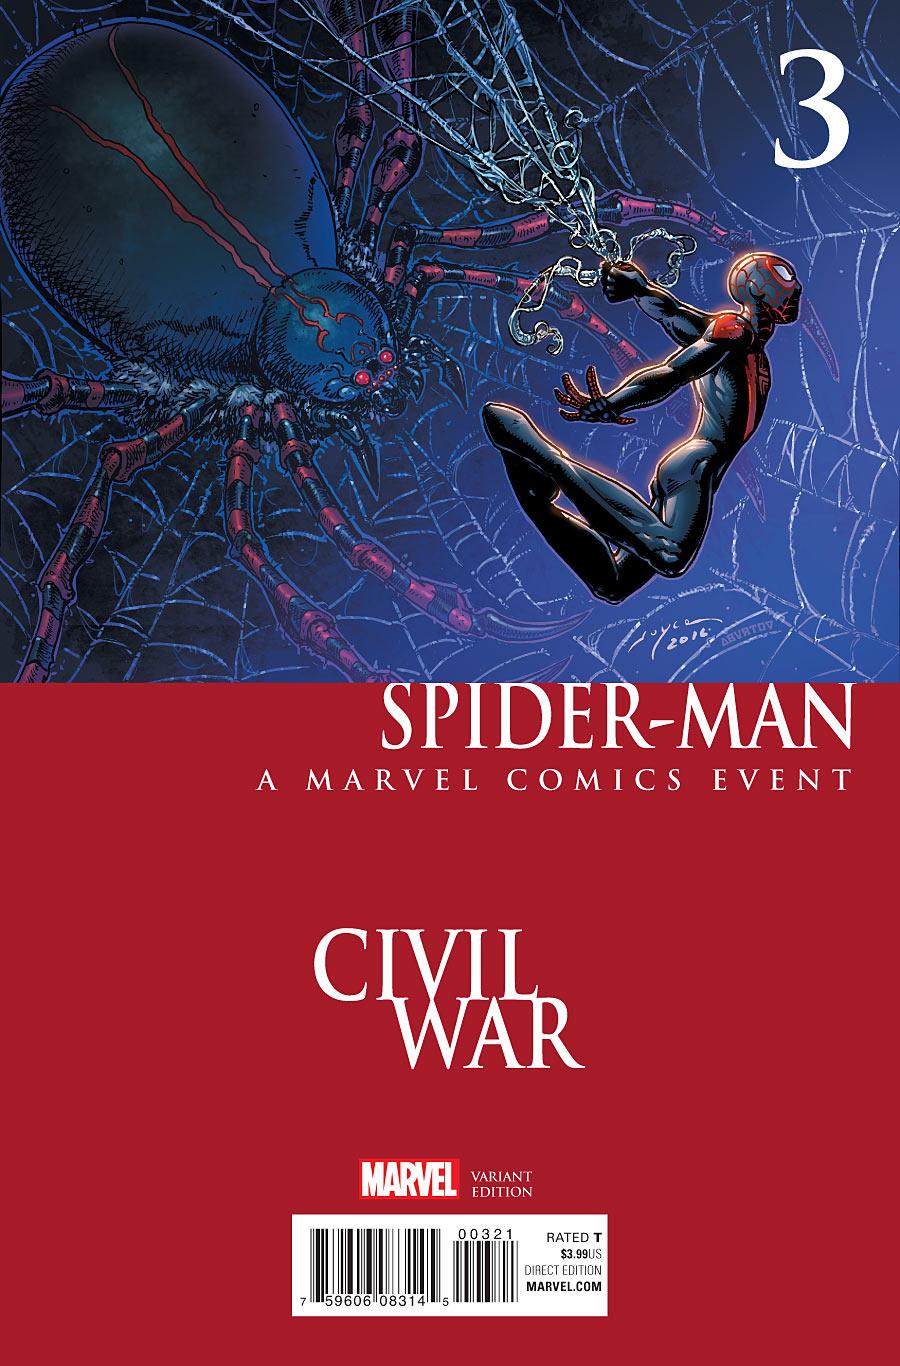 Spider-Man Vol 2 3 Civil War Variant.jpg